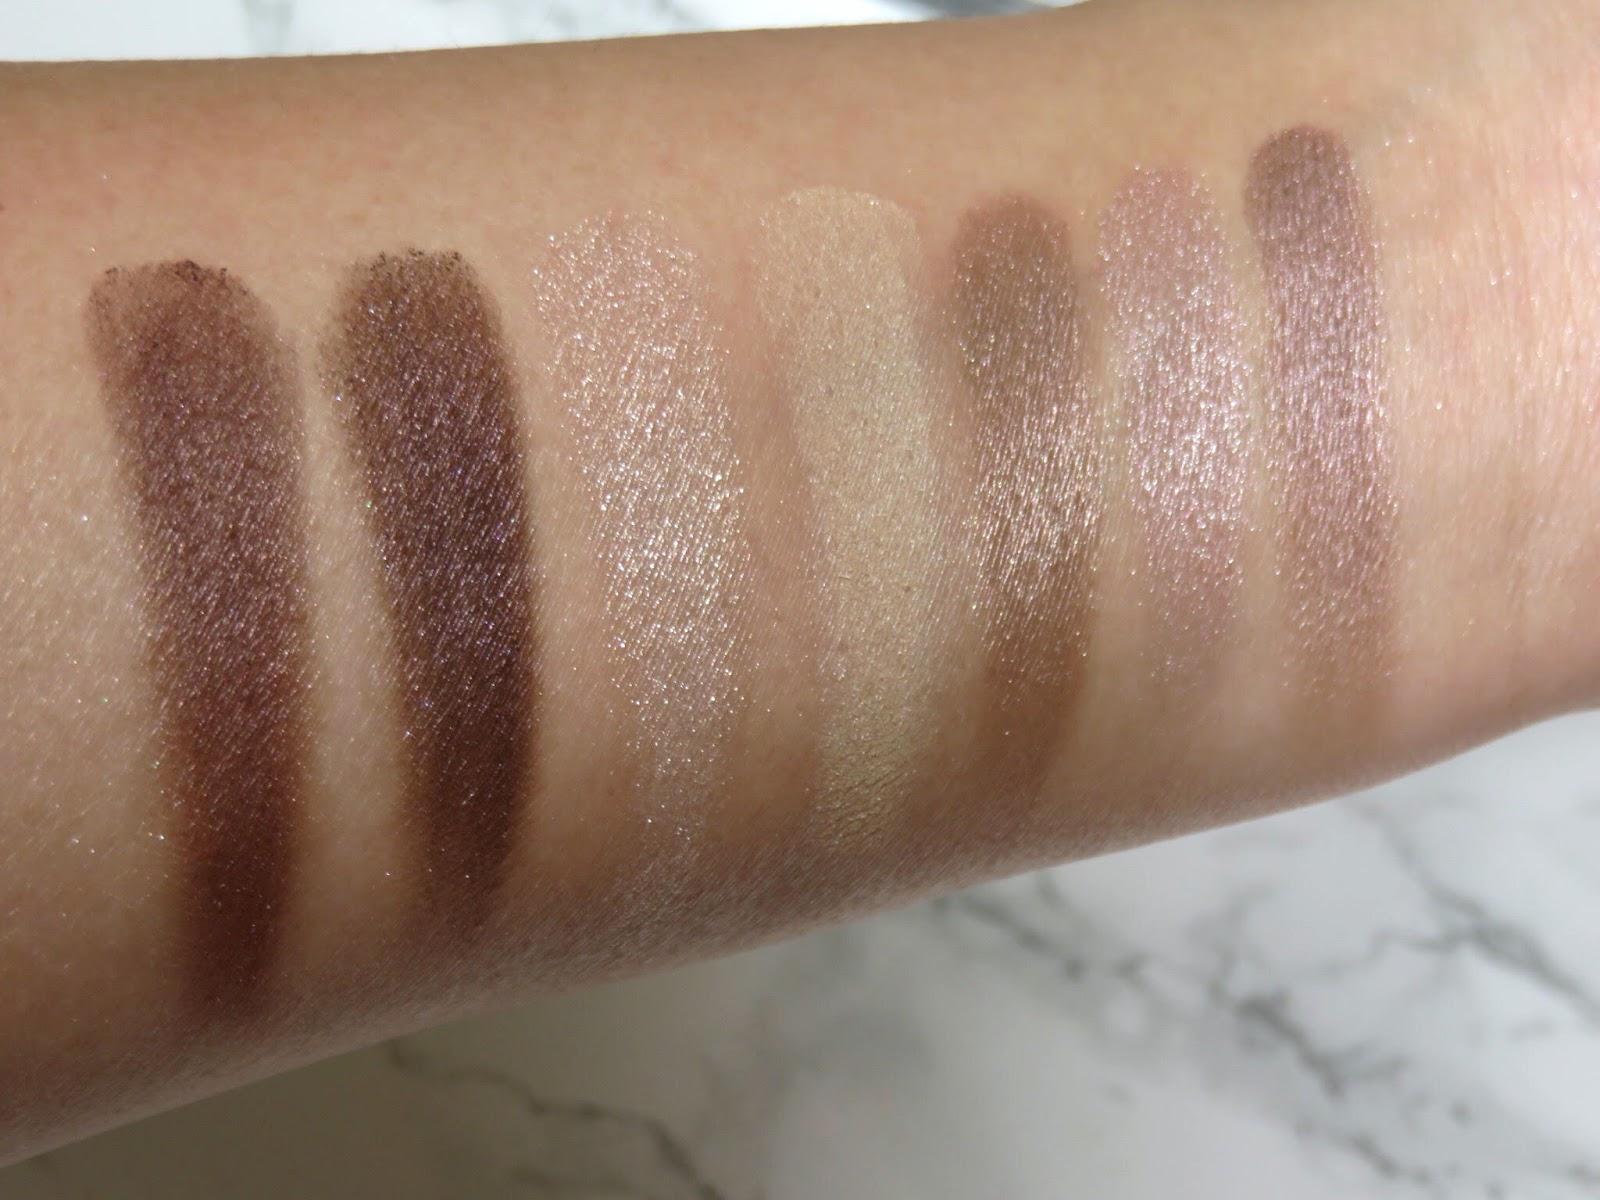 Backstage Eyeshadow Palette - Cool Neutrals by Dior #7